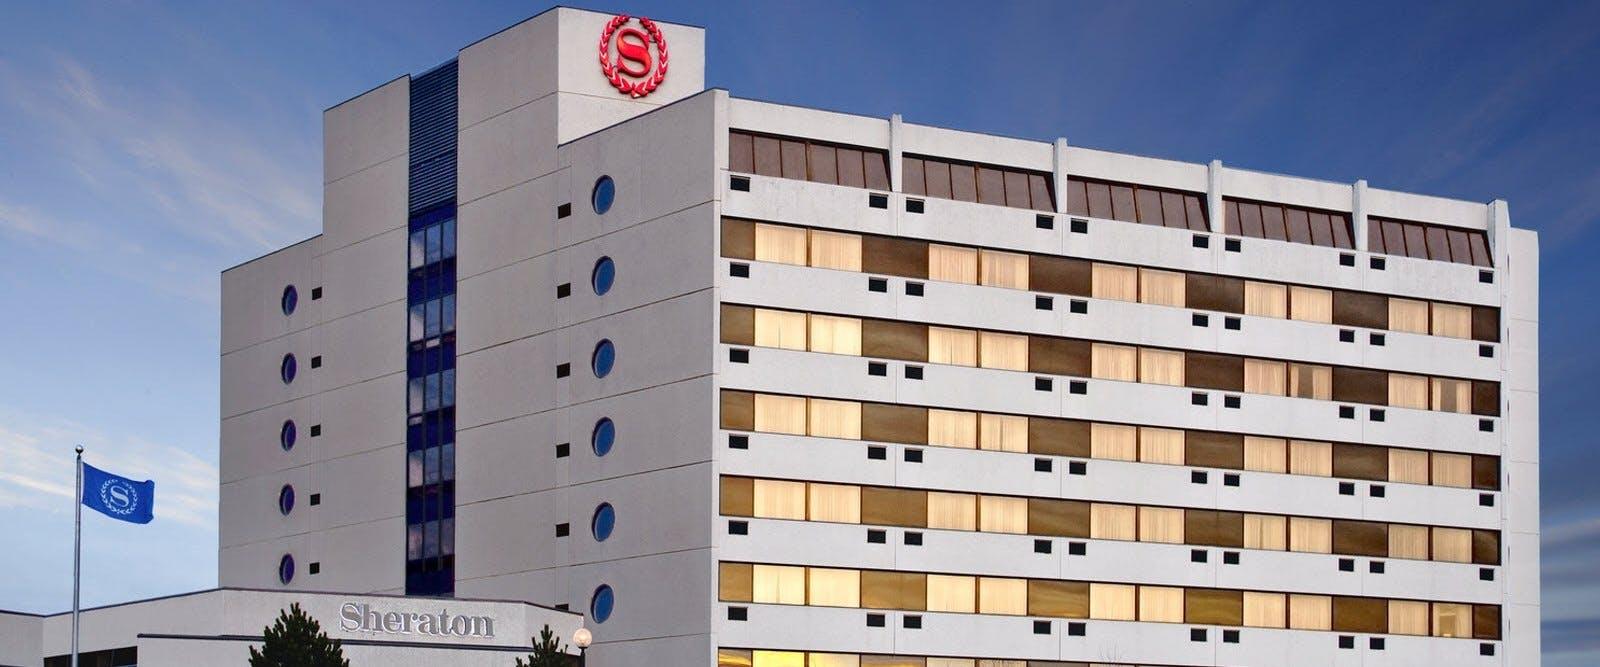 7 12 Exterior At Sheraton Hotel Newfoundland